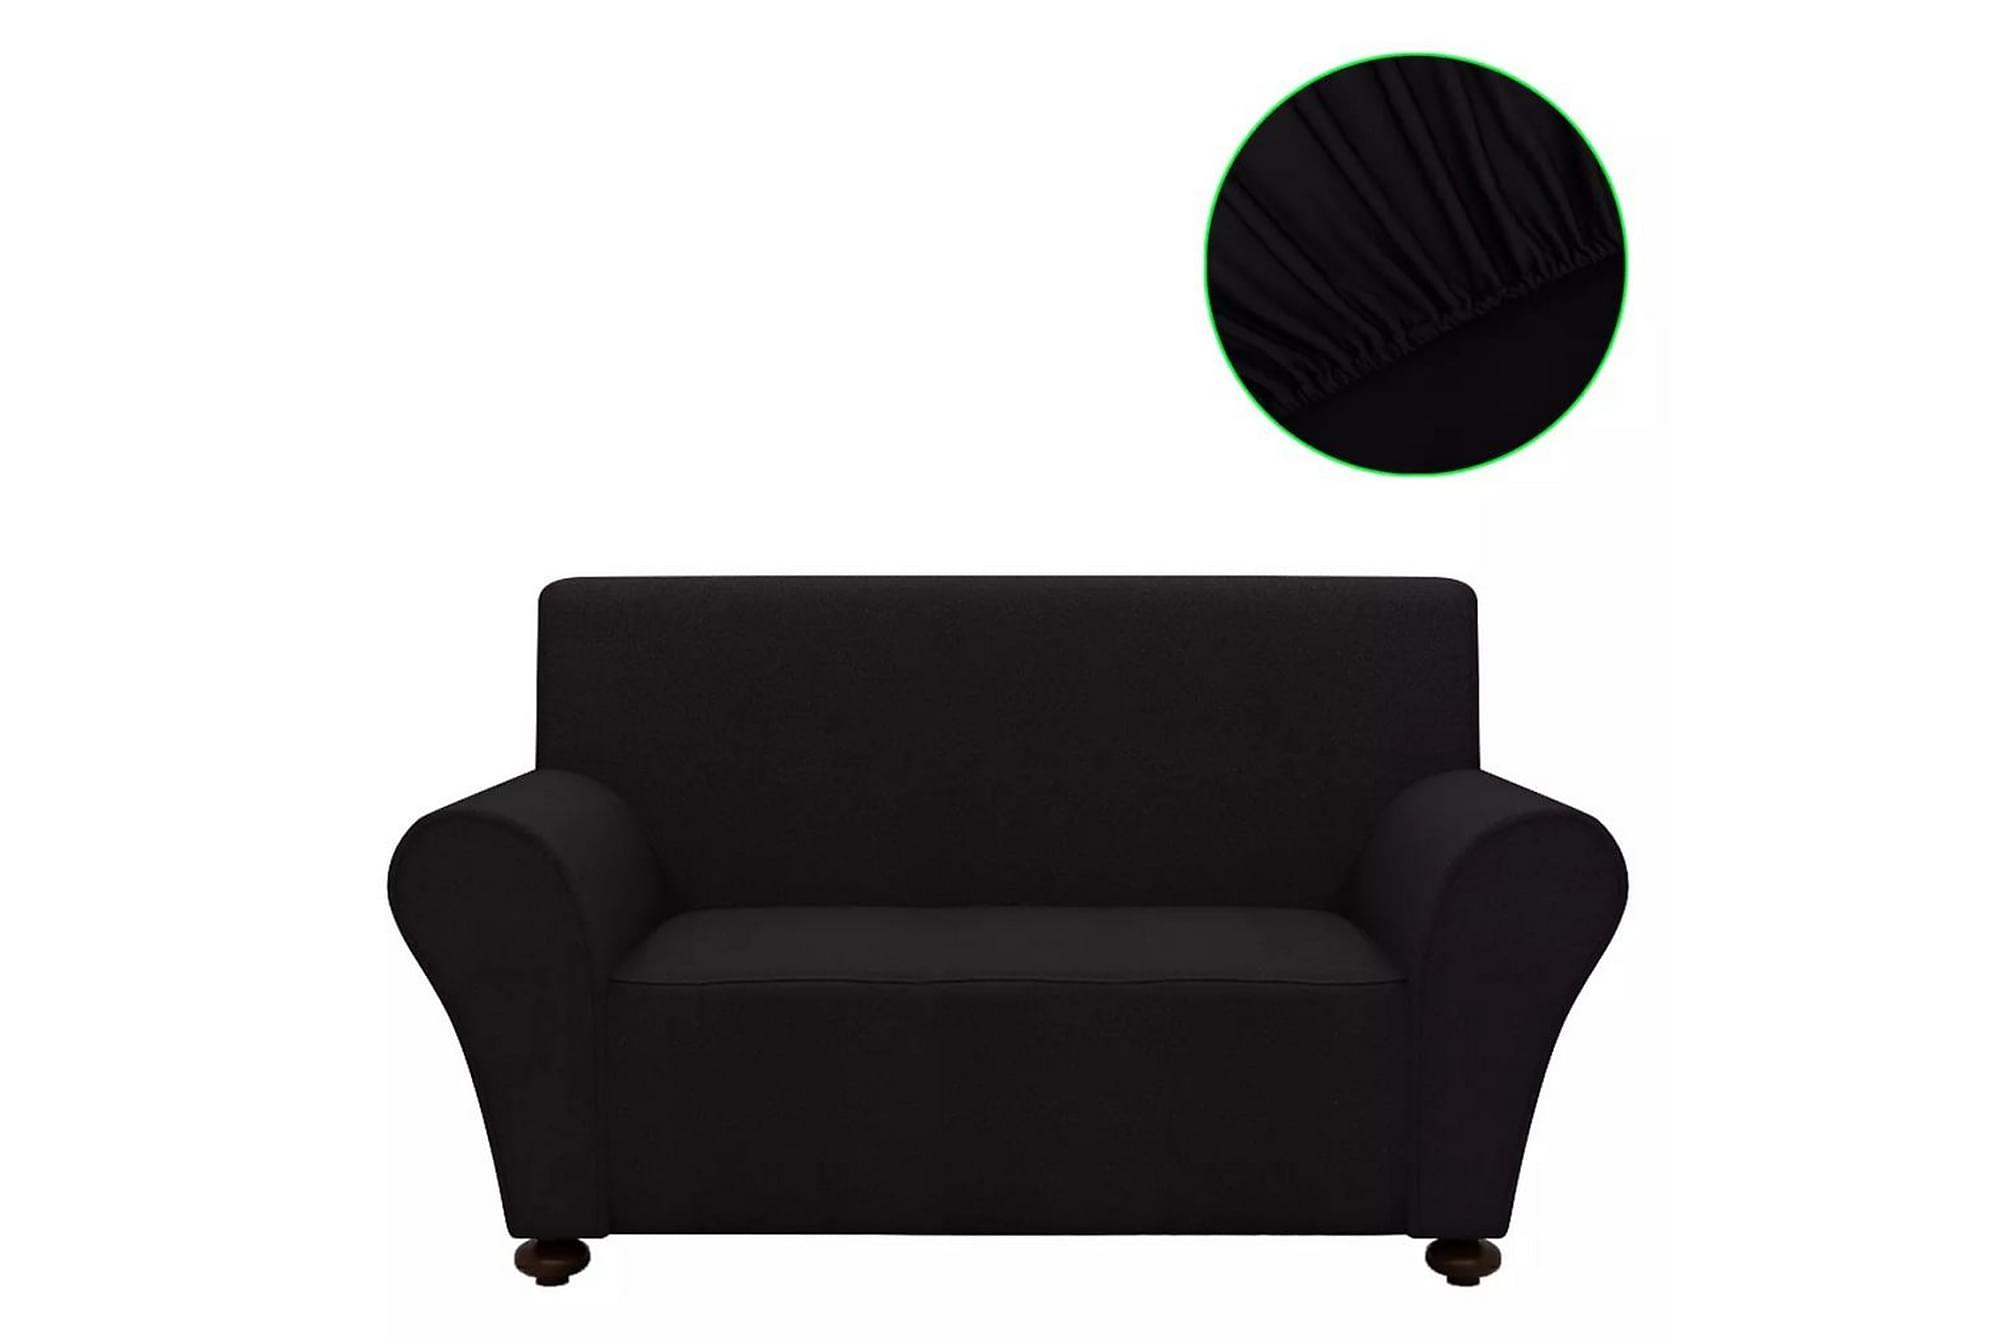 Sofföverdrag med stretch svart polyesterjersey